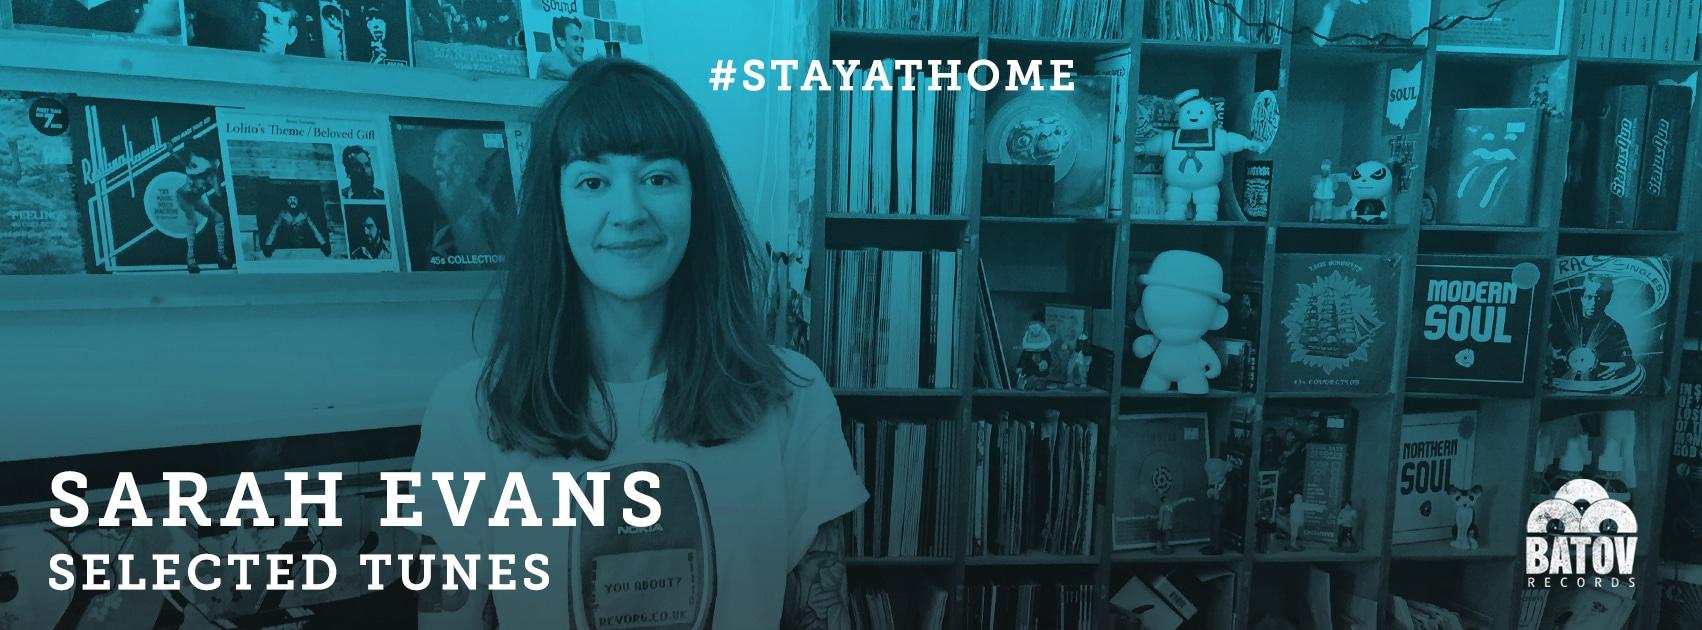 Sarah Evans Selected Tunes